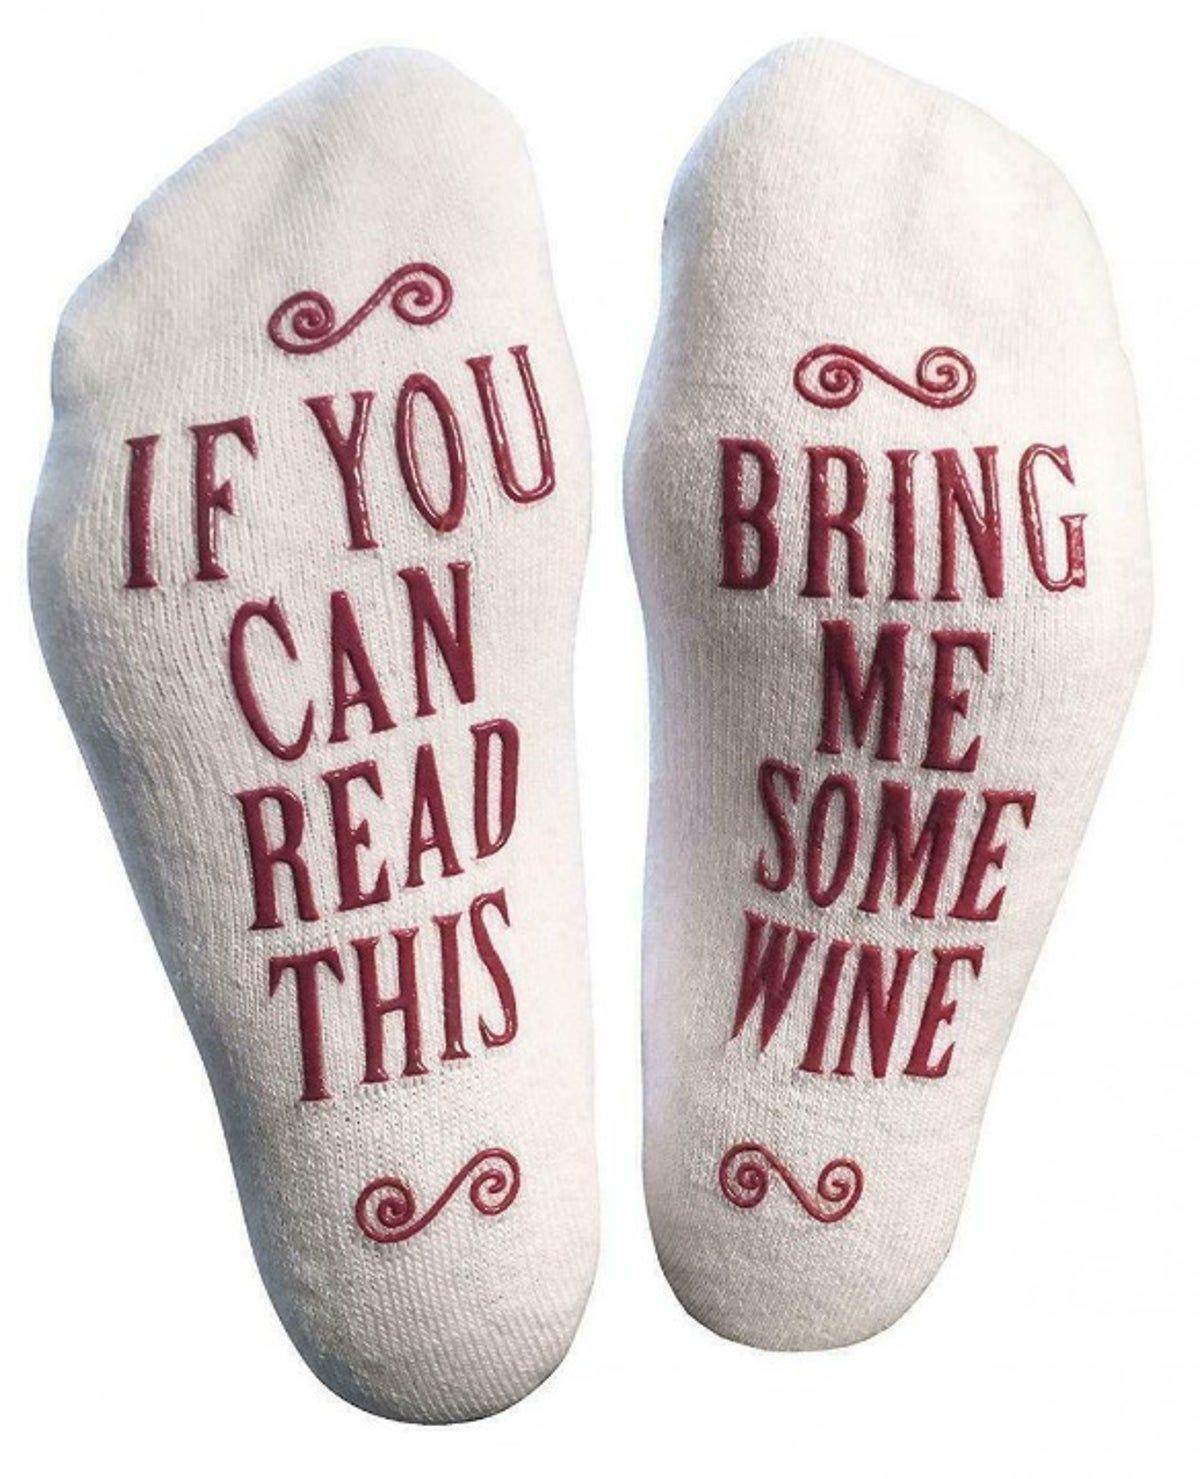 Womens Novelty Socks Non-Skid #schrottwichtelnideen